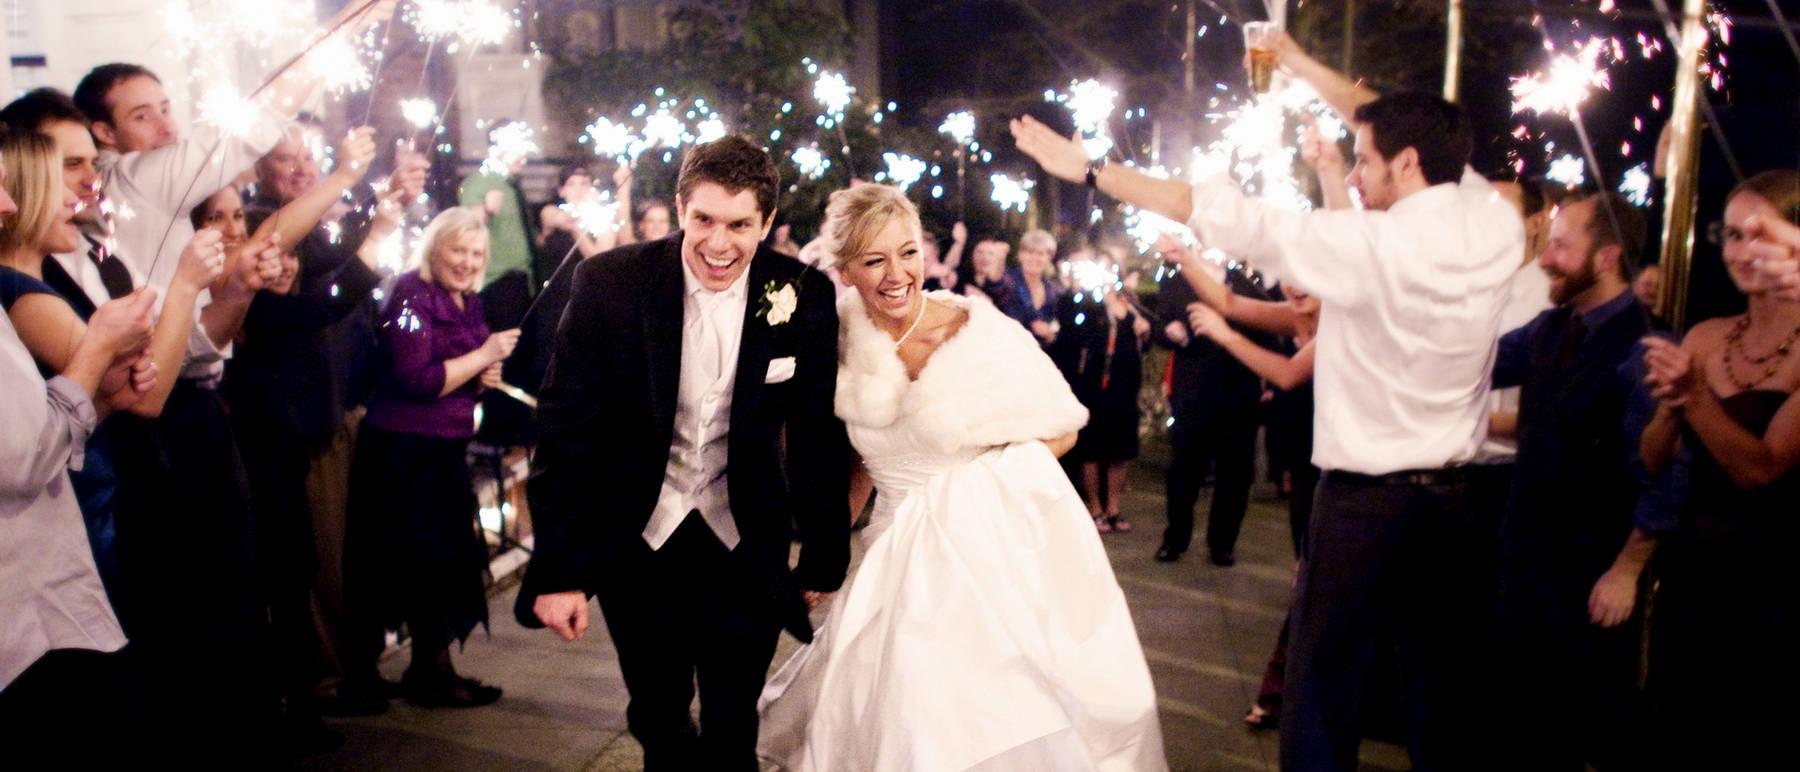 johnandjoseph-wedding-photographer-hz-slider-128